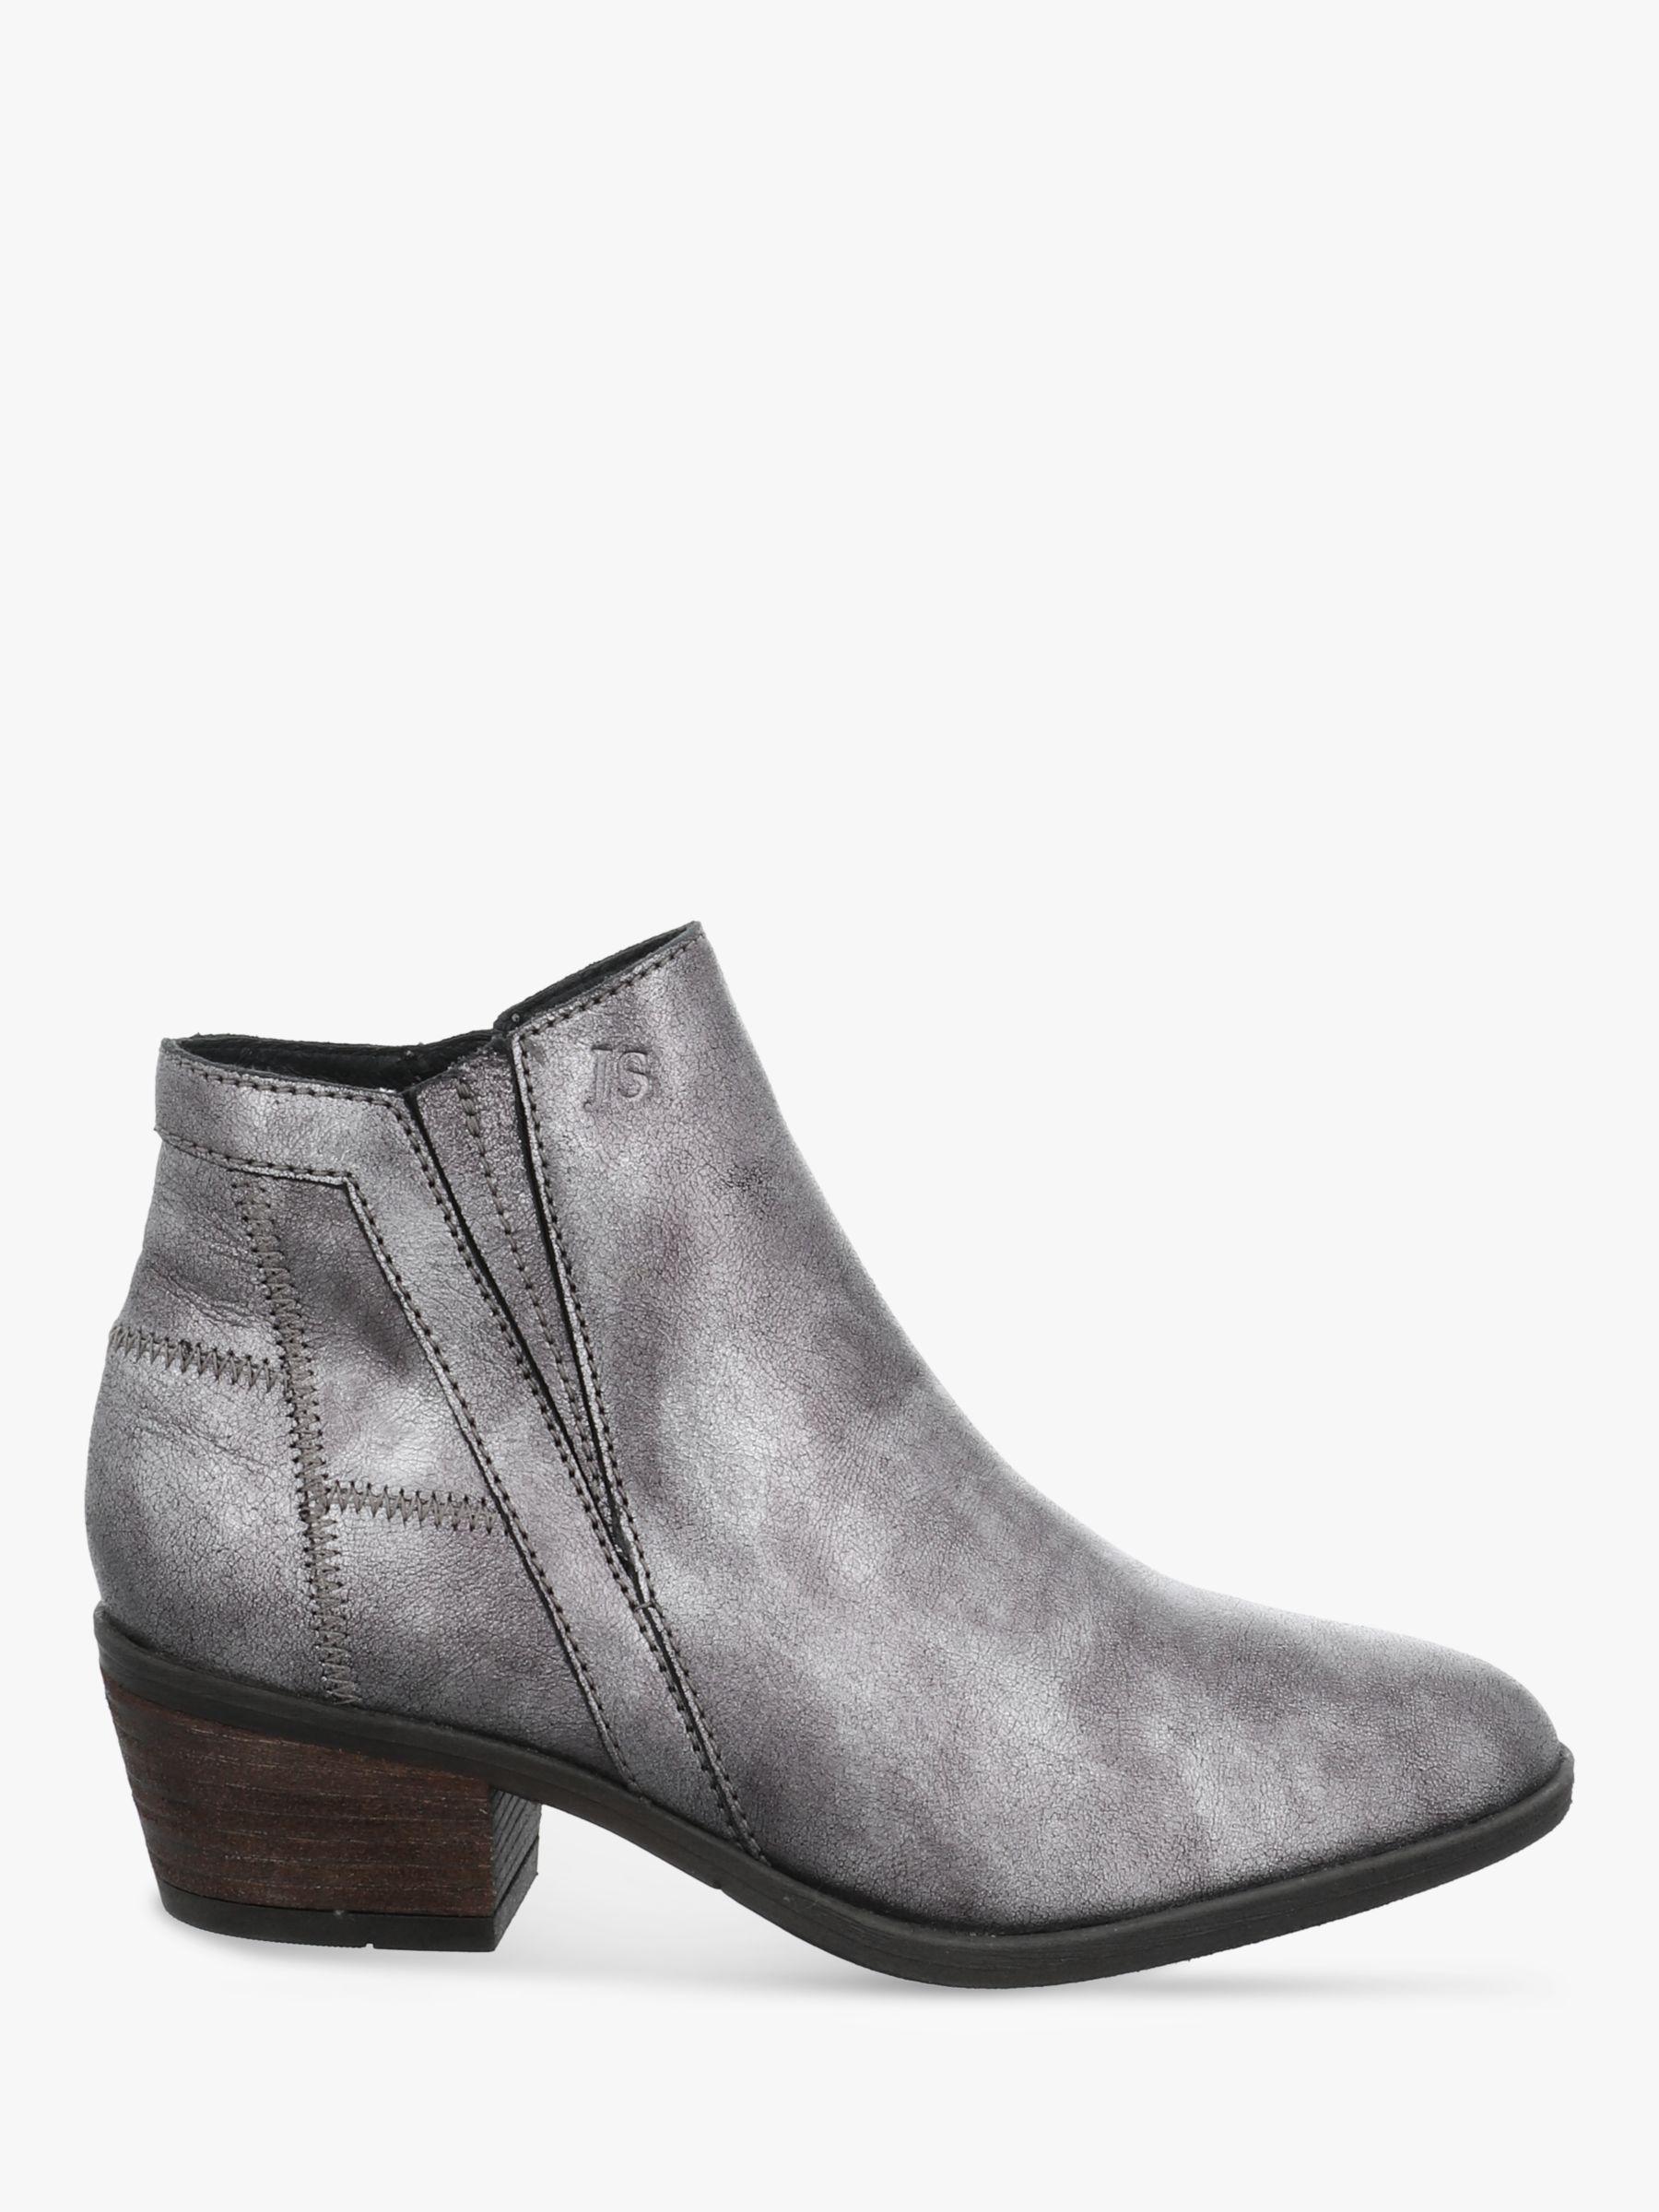 Josef Seibel Josef Seibel Daphne 9 Block Heel Ankle Boots, Basalt